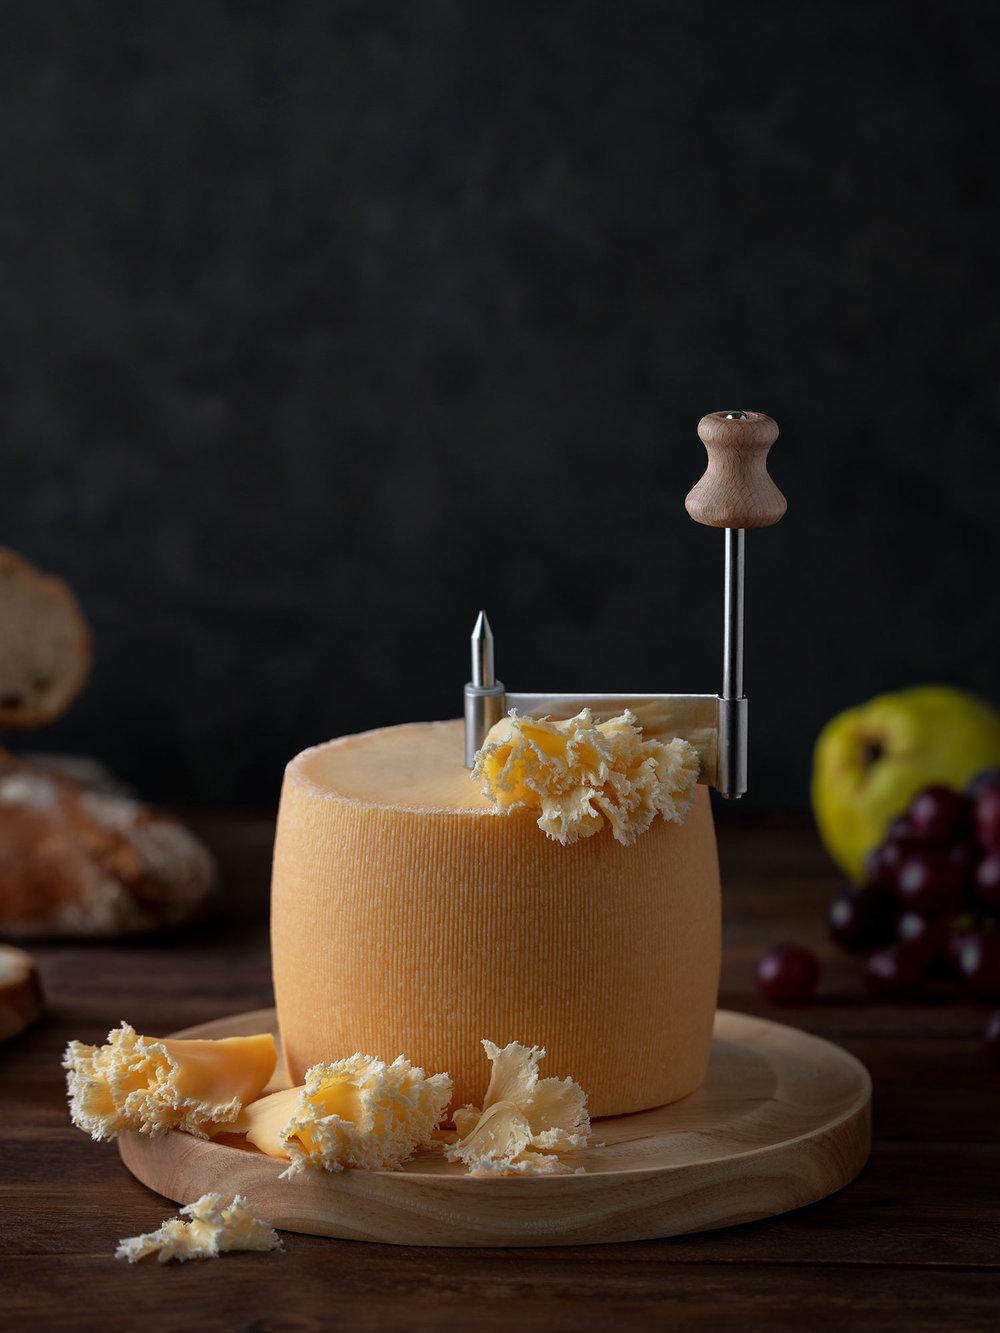 corina-landa-food-photography-fotografia-gastronomica-0186.jpg